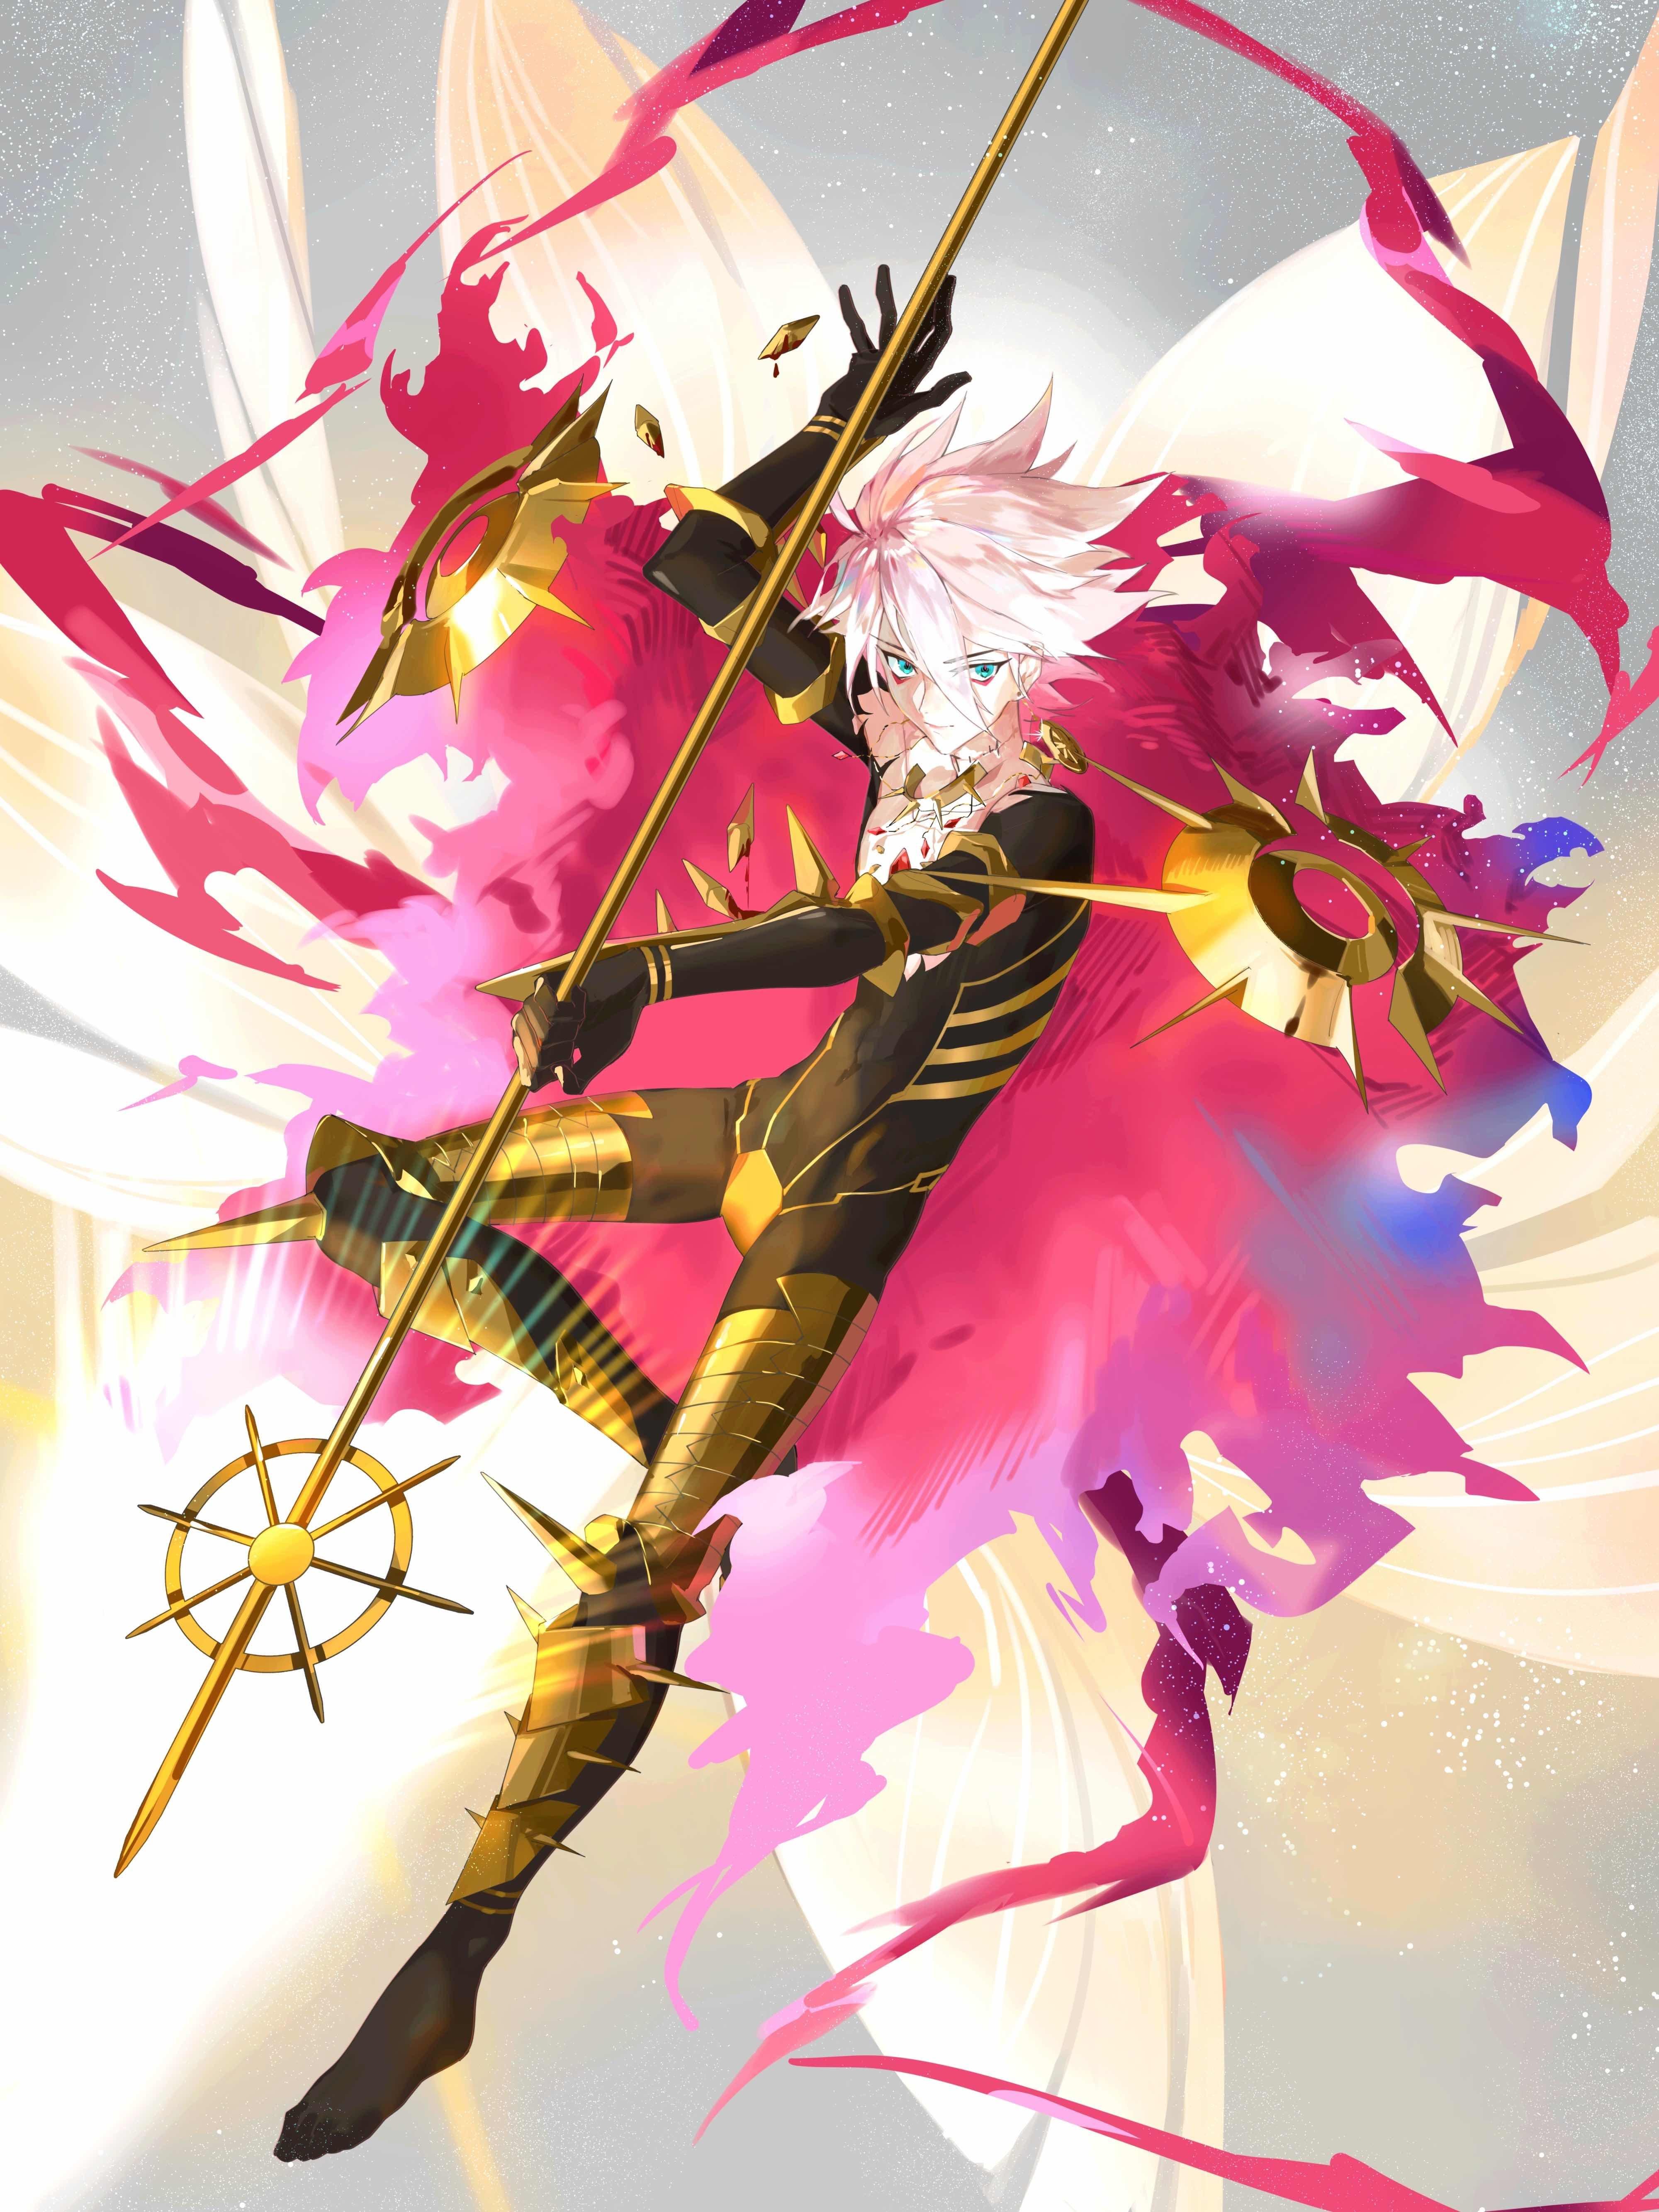 Fate grandorder karna 2017 - 2017 anime wallpaper ...